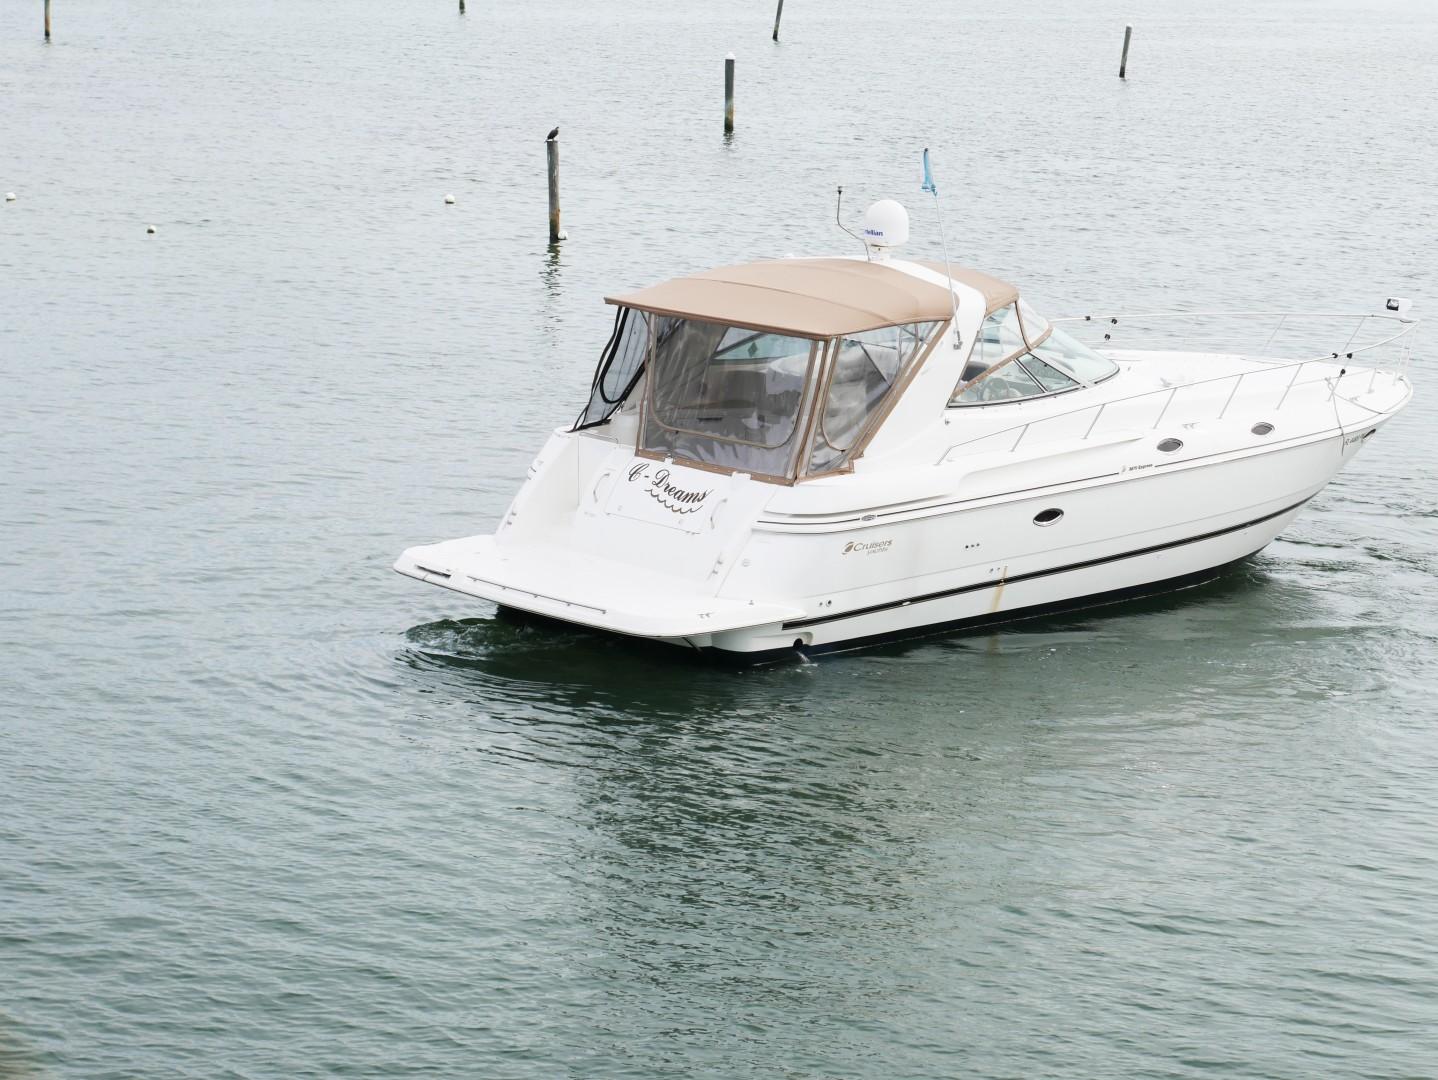 Cruisers-3870 Express 2000-CDreams Destin-Florida-United States-2000 38 Cruisers CDreams Starboard -1420236 | Thumbnail